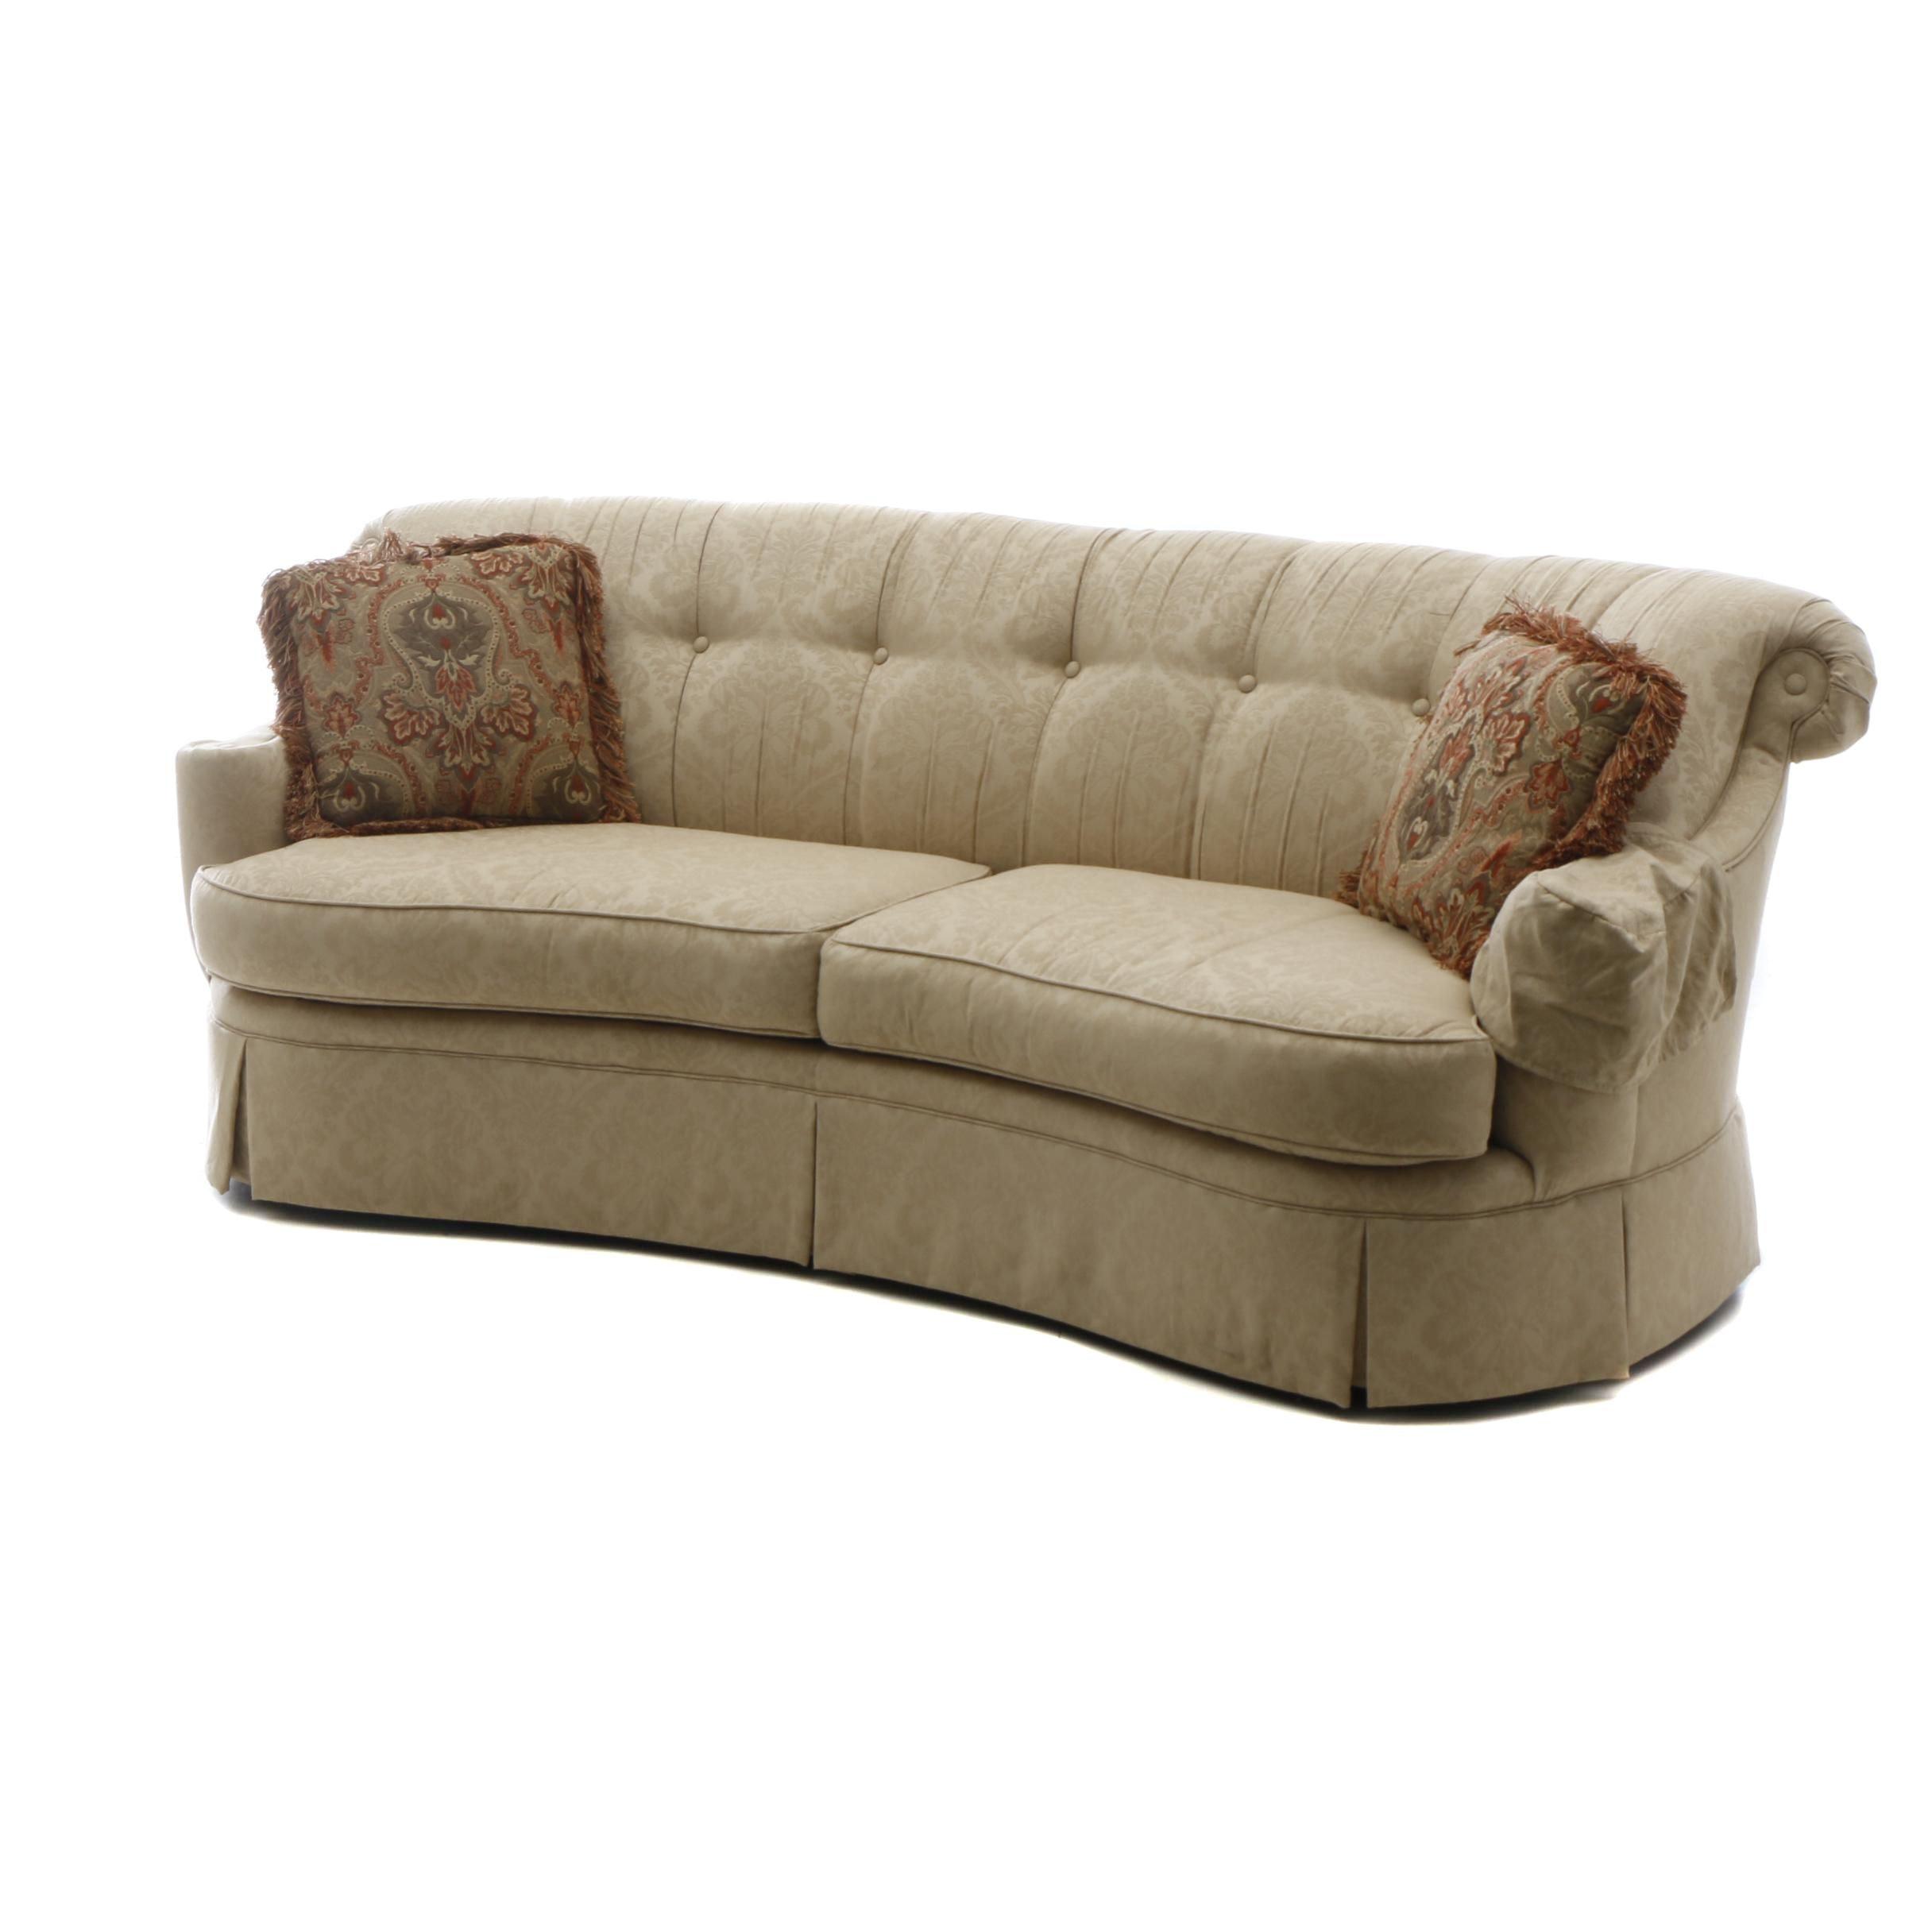 Traditional Temple Furniture Sofa